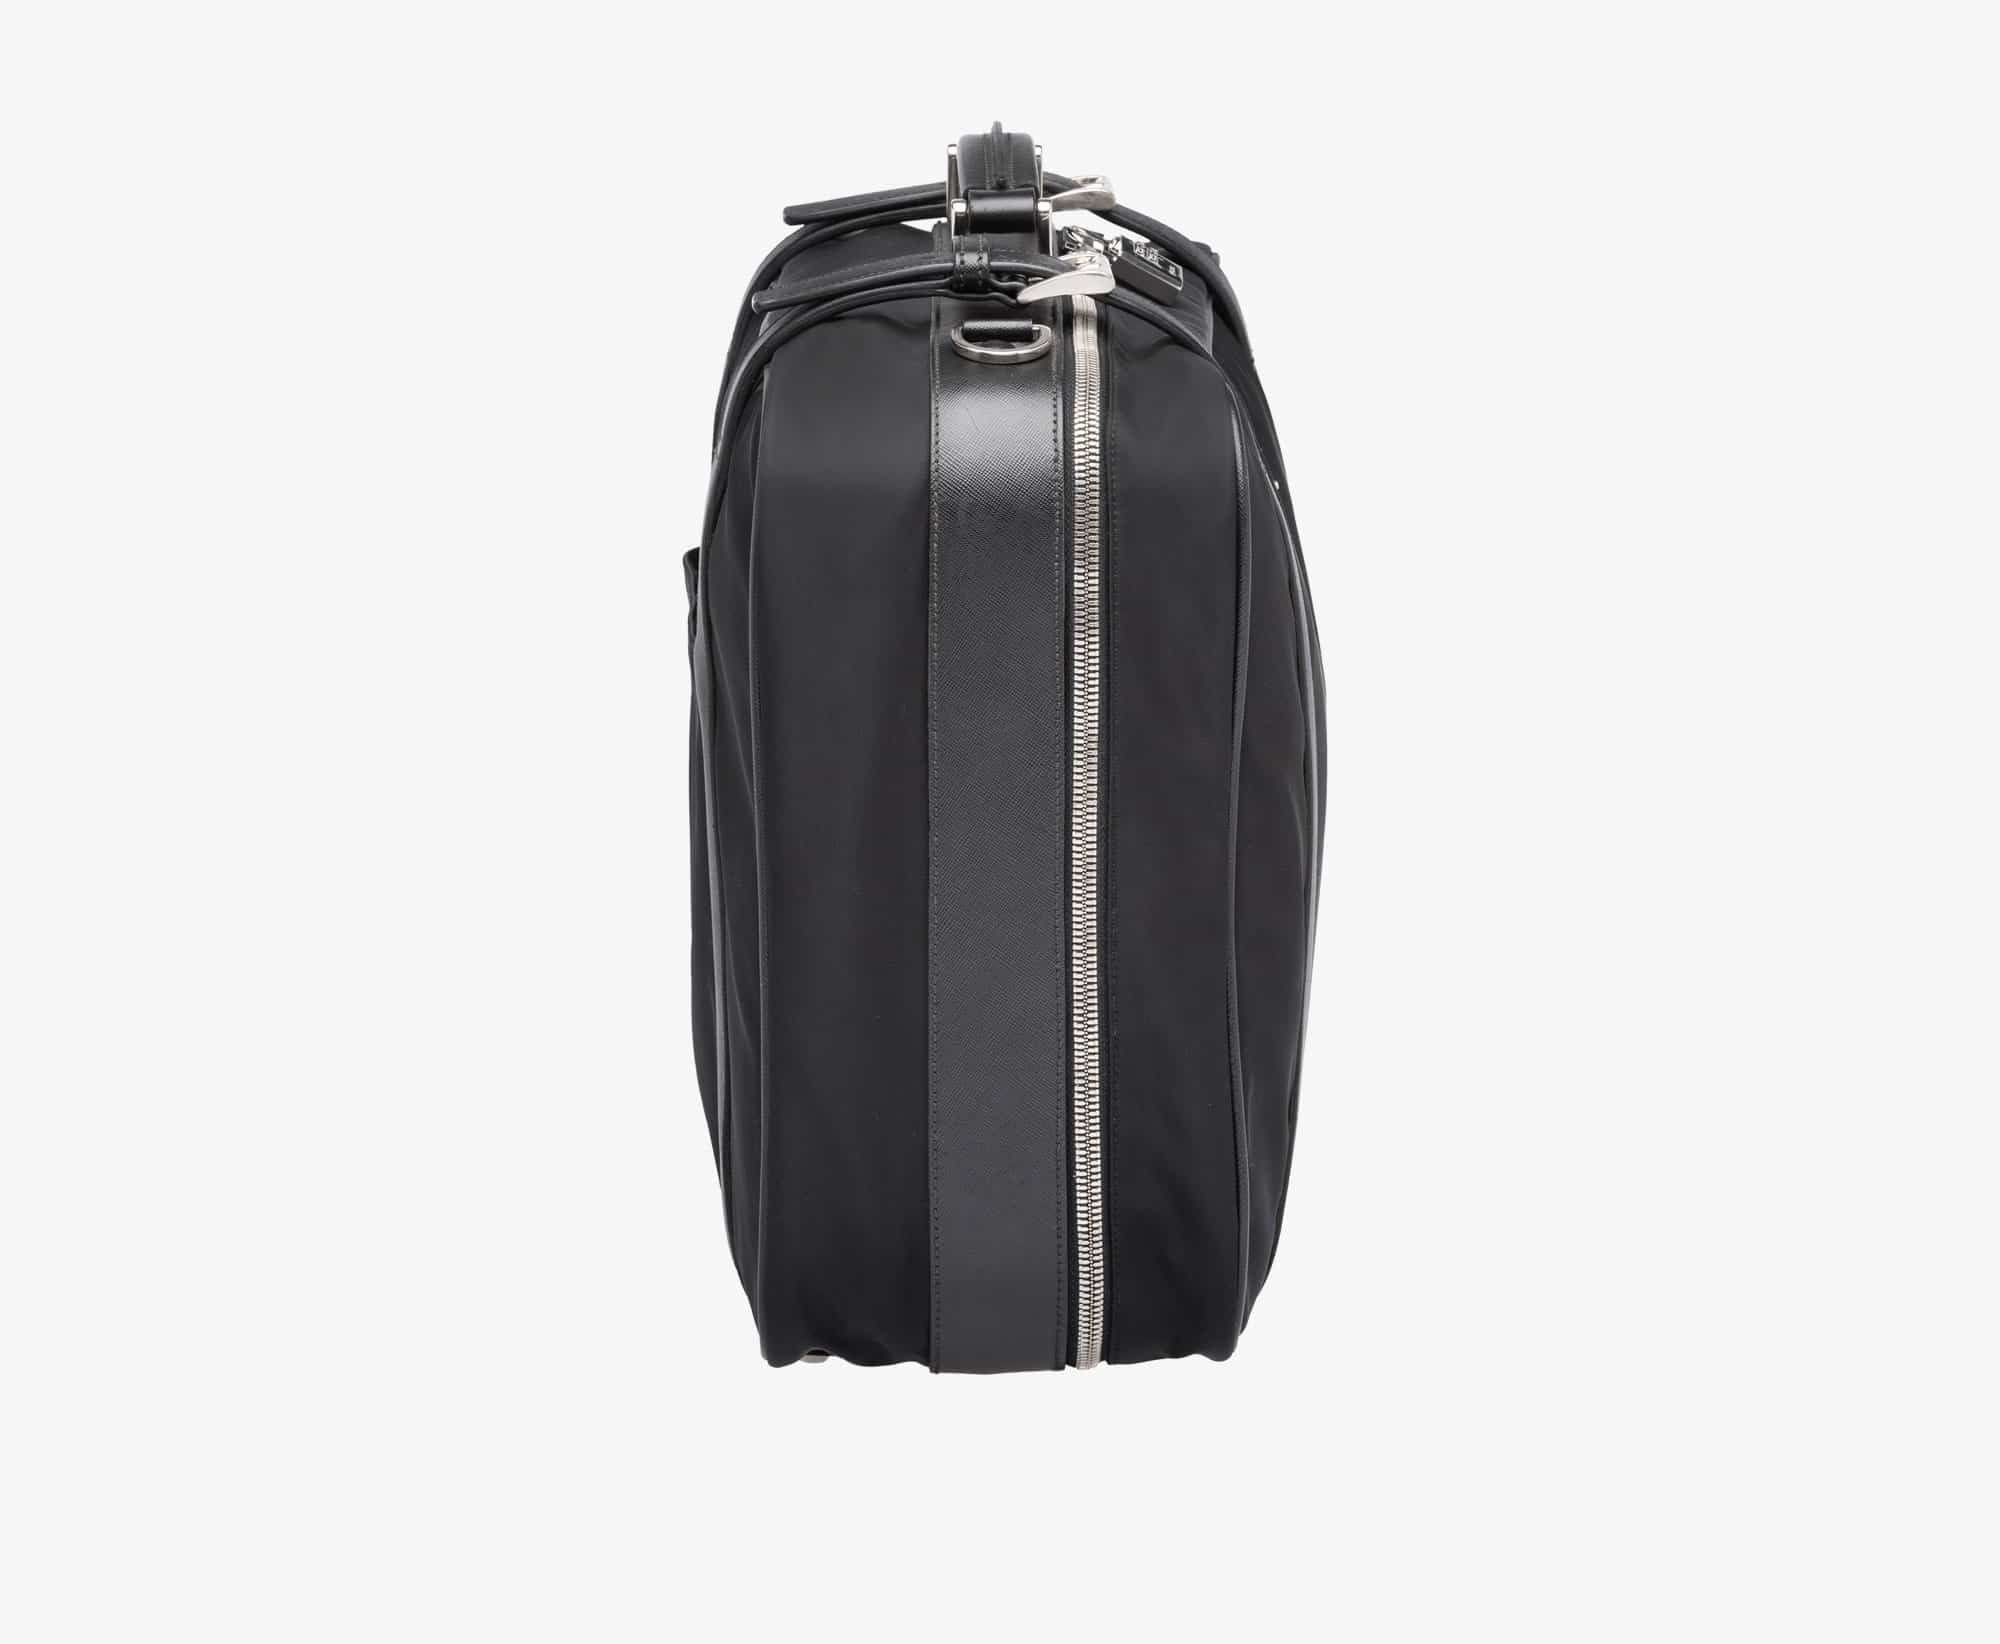 Prada Weekender Luggage Bag Black [2VV149 064 F0002 V OOO]